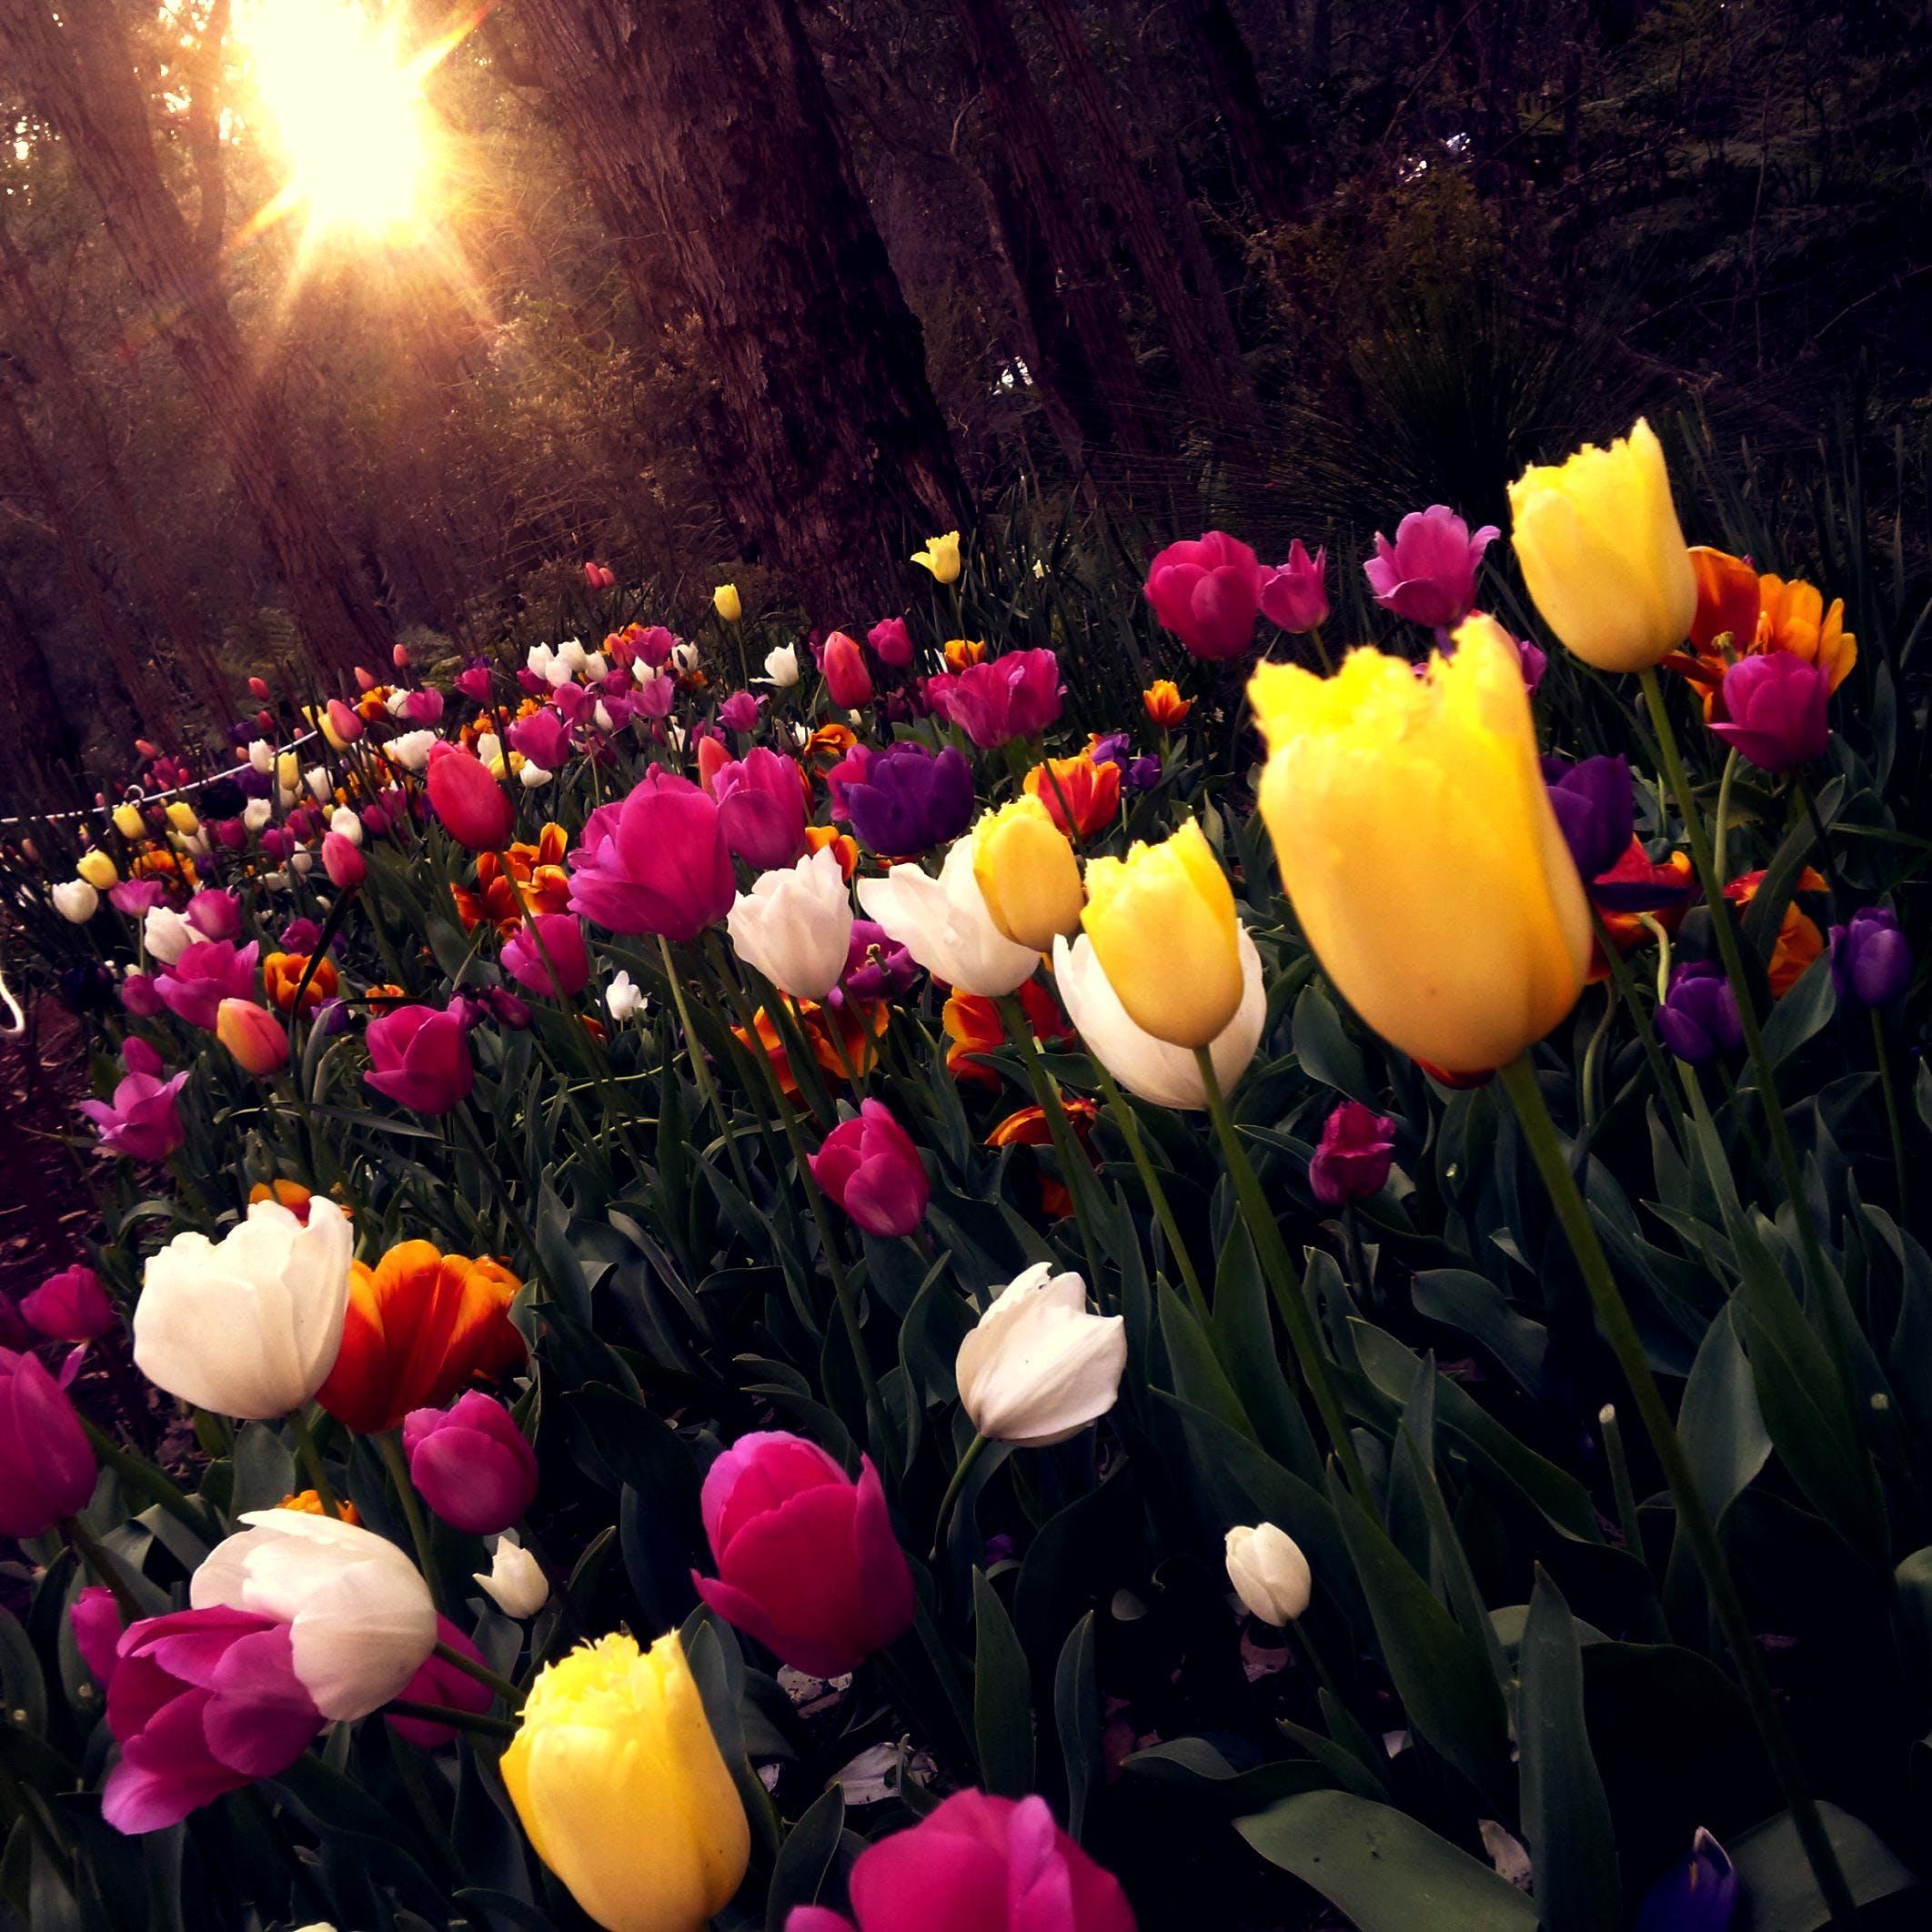 Yellow and White Tulips Field